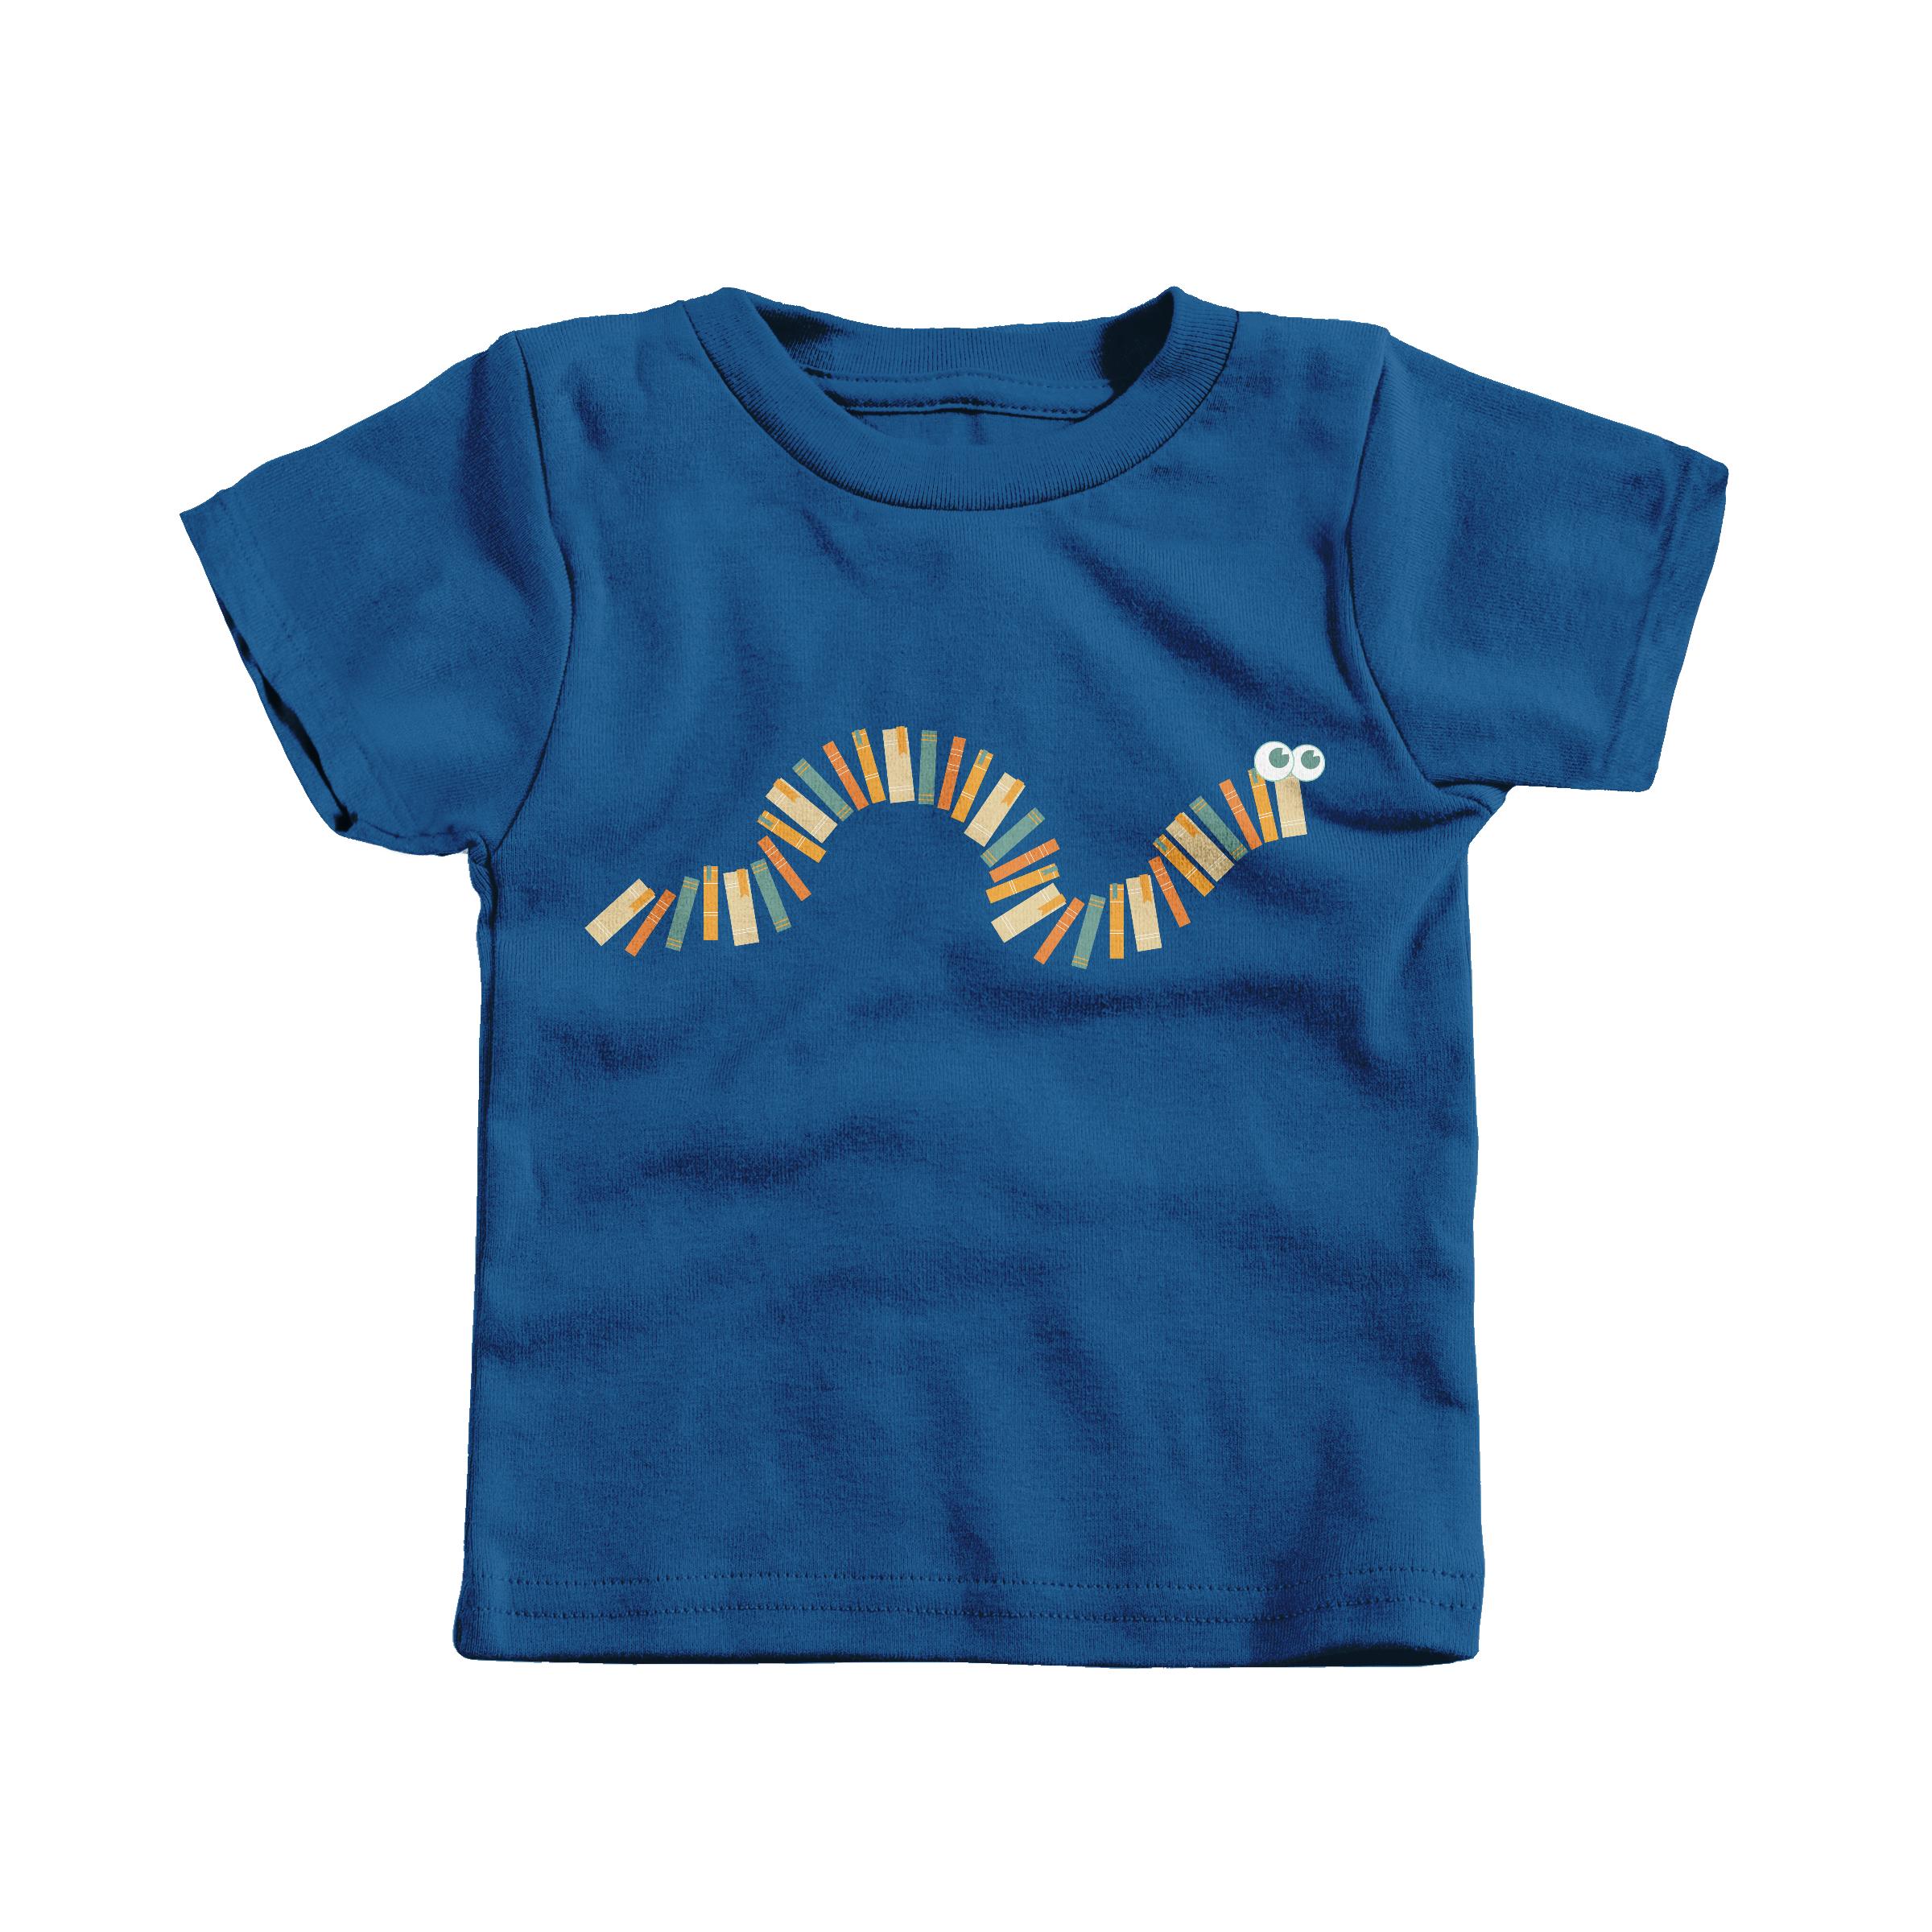 Bookworm Royal (Infant)